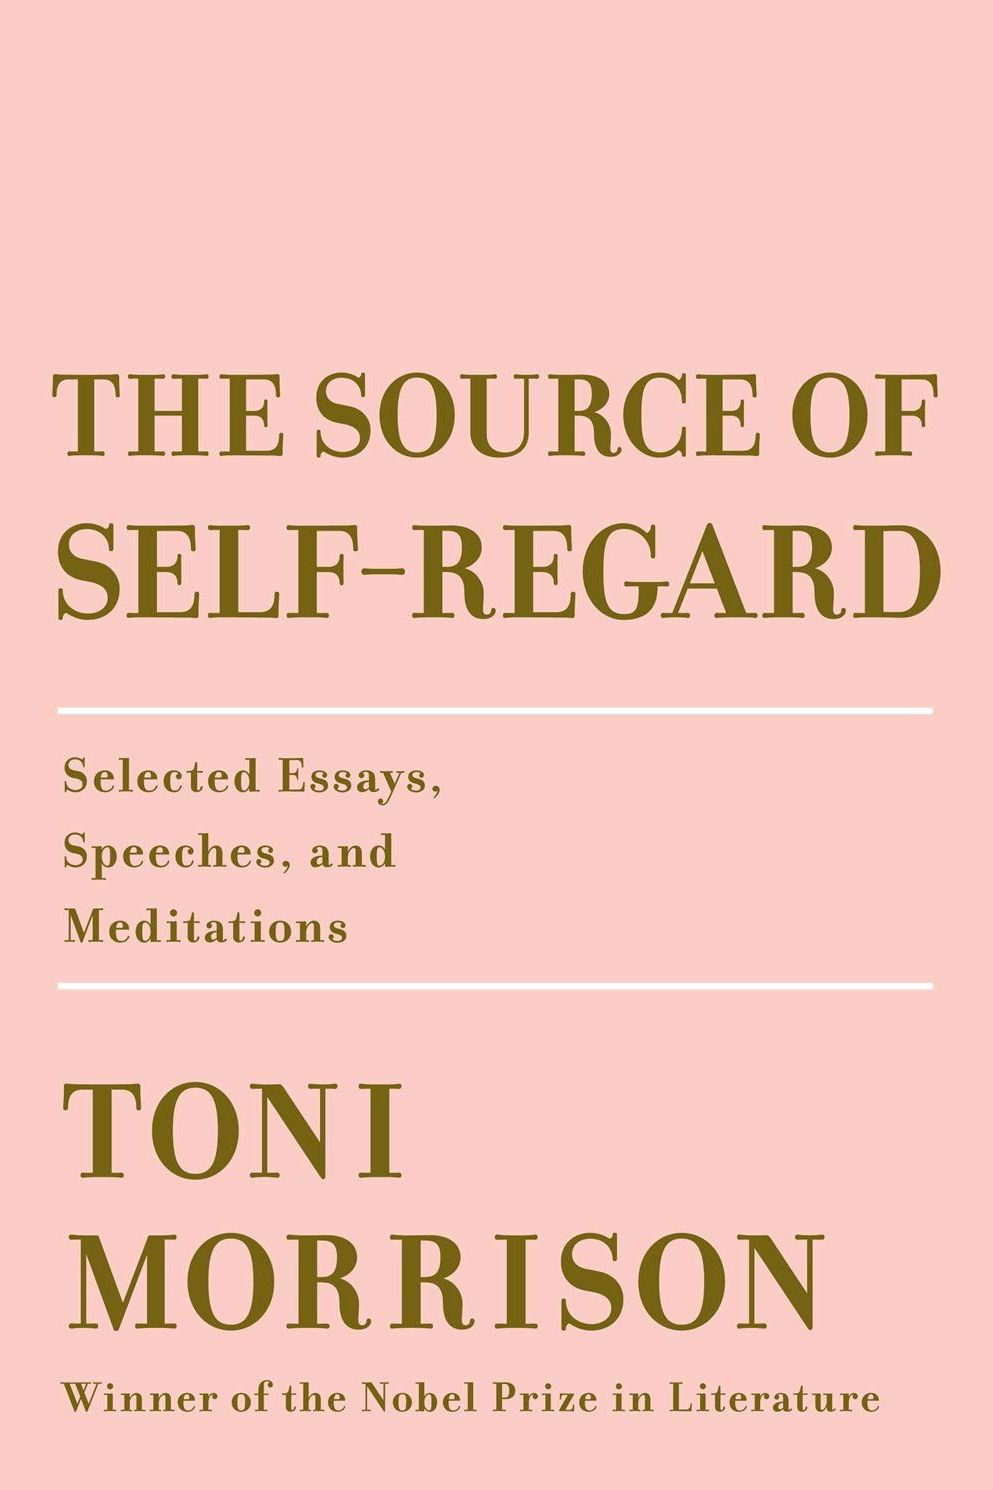 The Source of Self Regard, by Toni Morrison